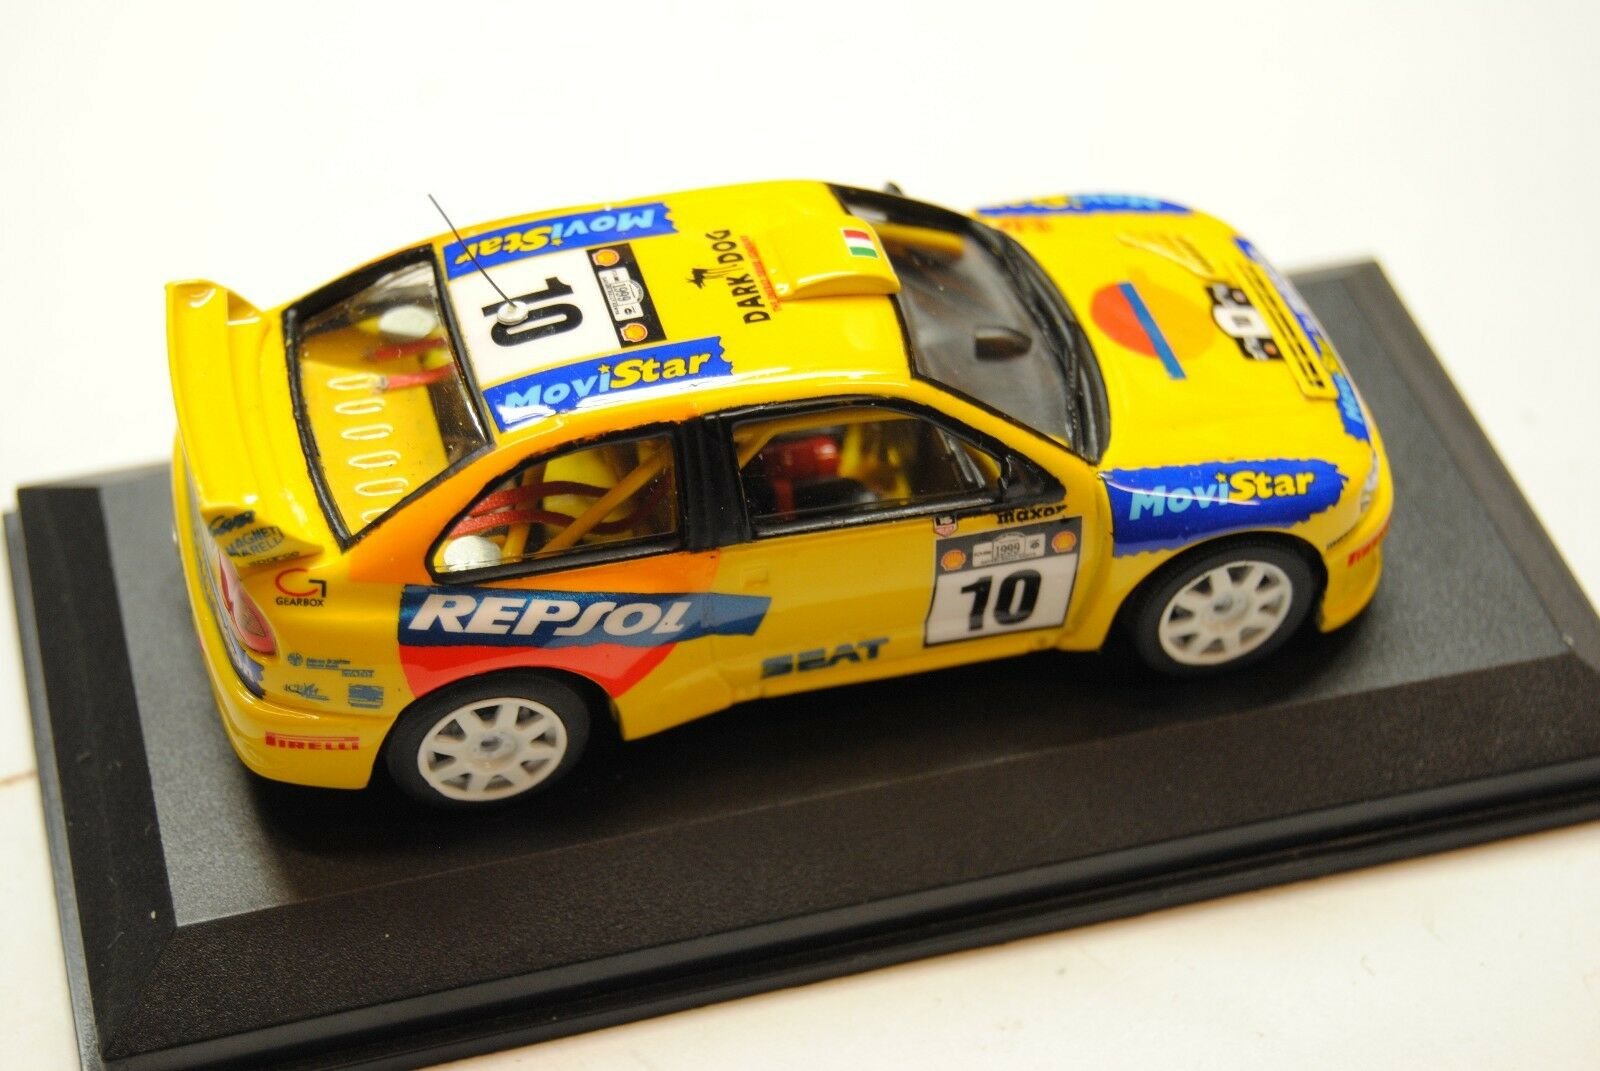 Säte Cordoba WRC 99 tävlings43